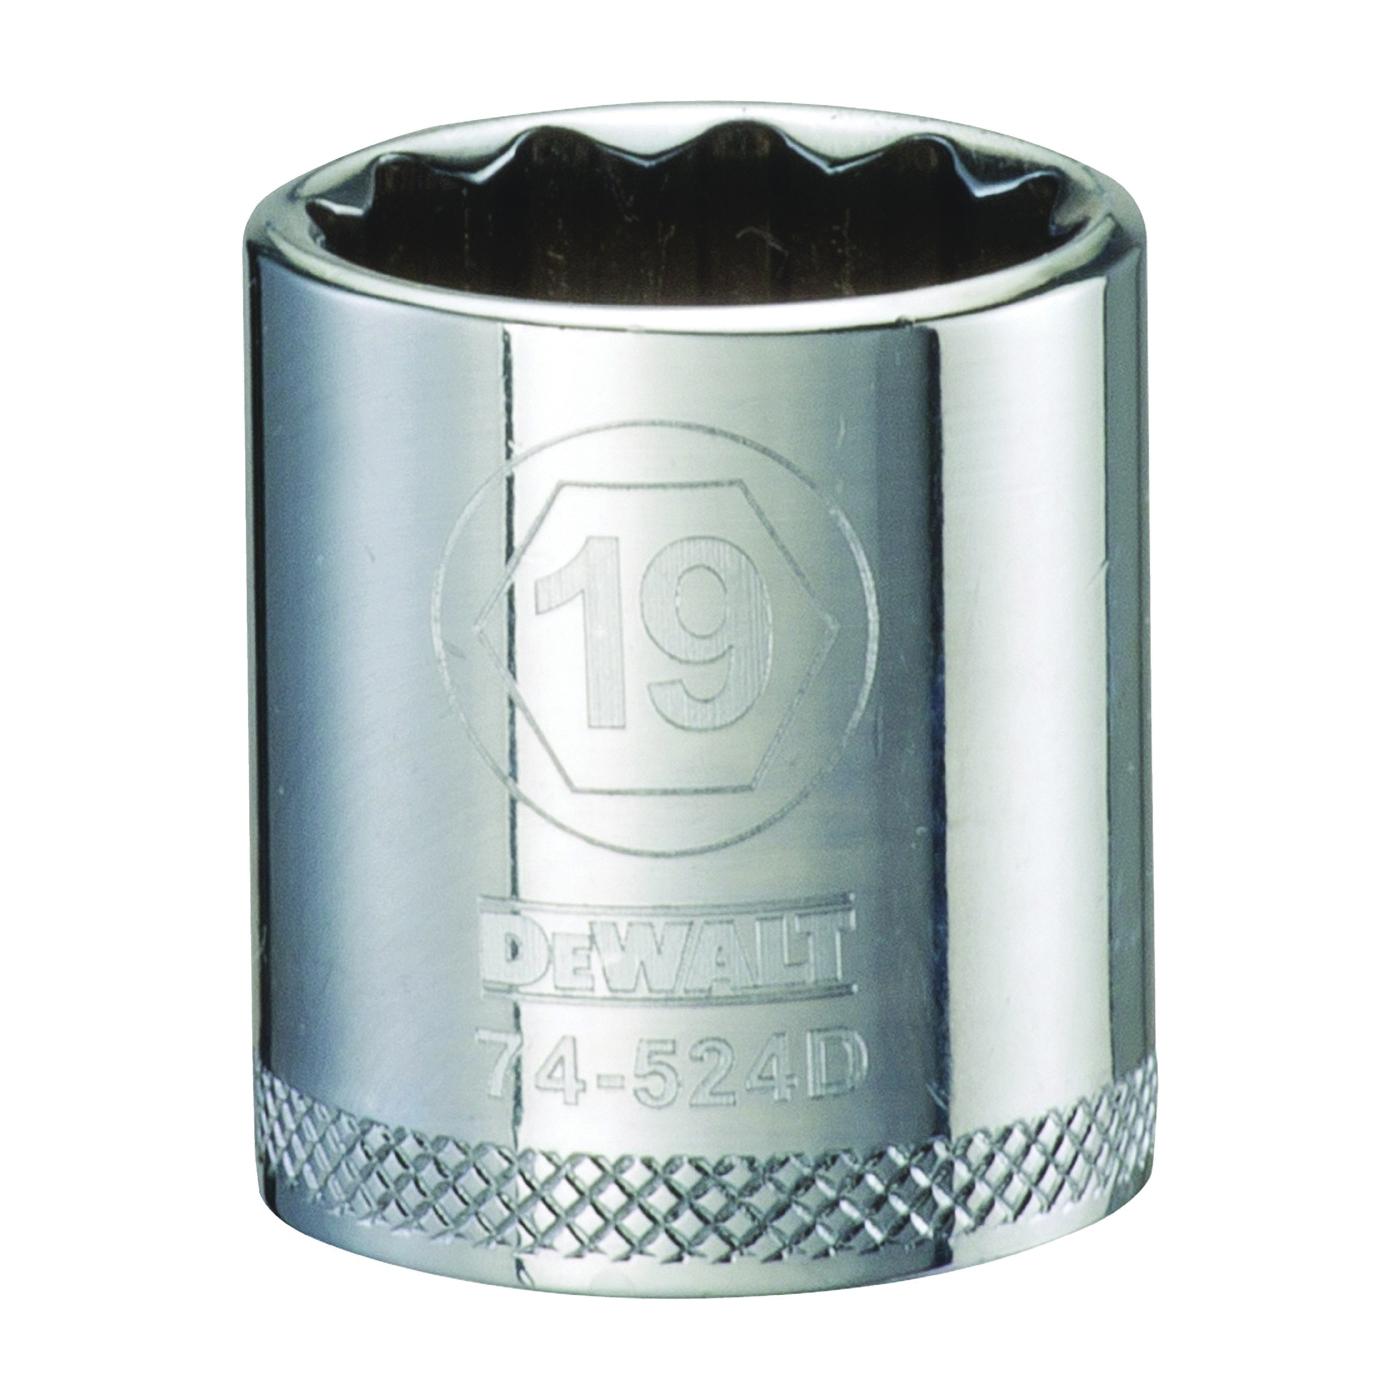 Picture of DeWALT DWMT74524OSP Hand Socket, 19 mm Socket, 3/8 in Drive, 12 -Point, Vanadium Steel, Polished Chrome